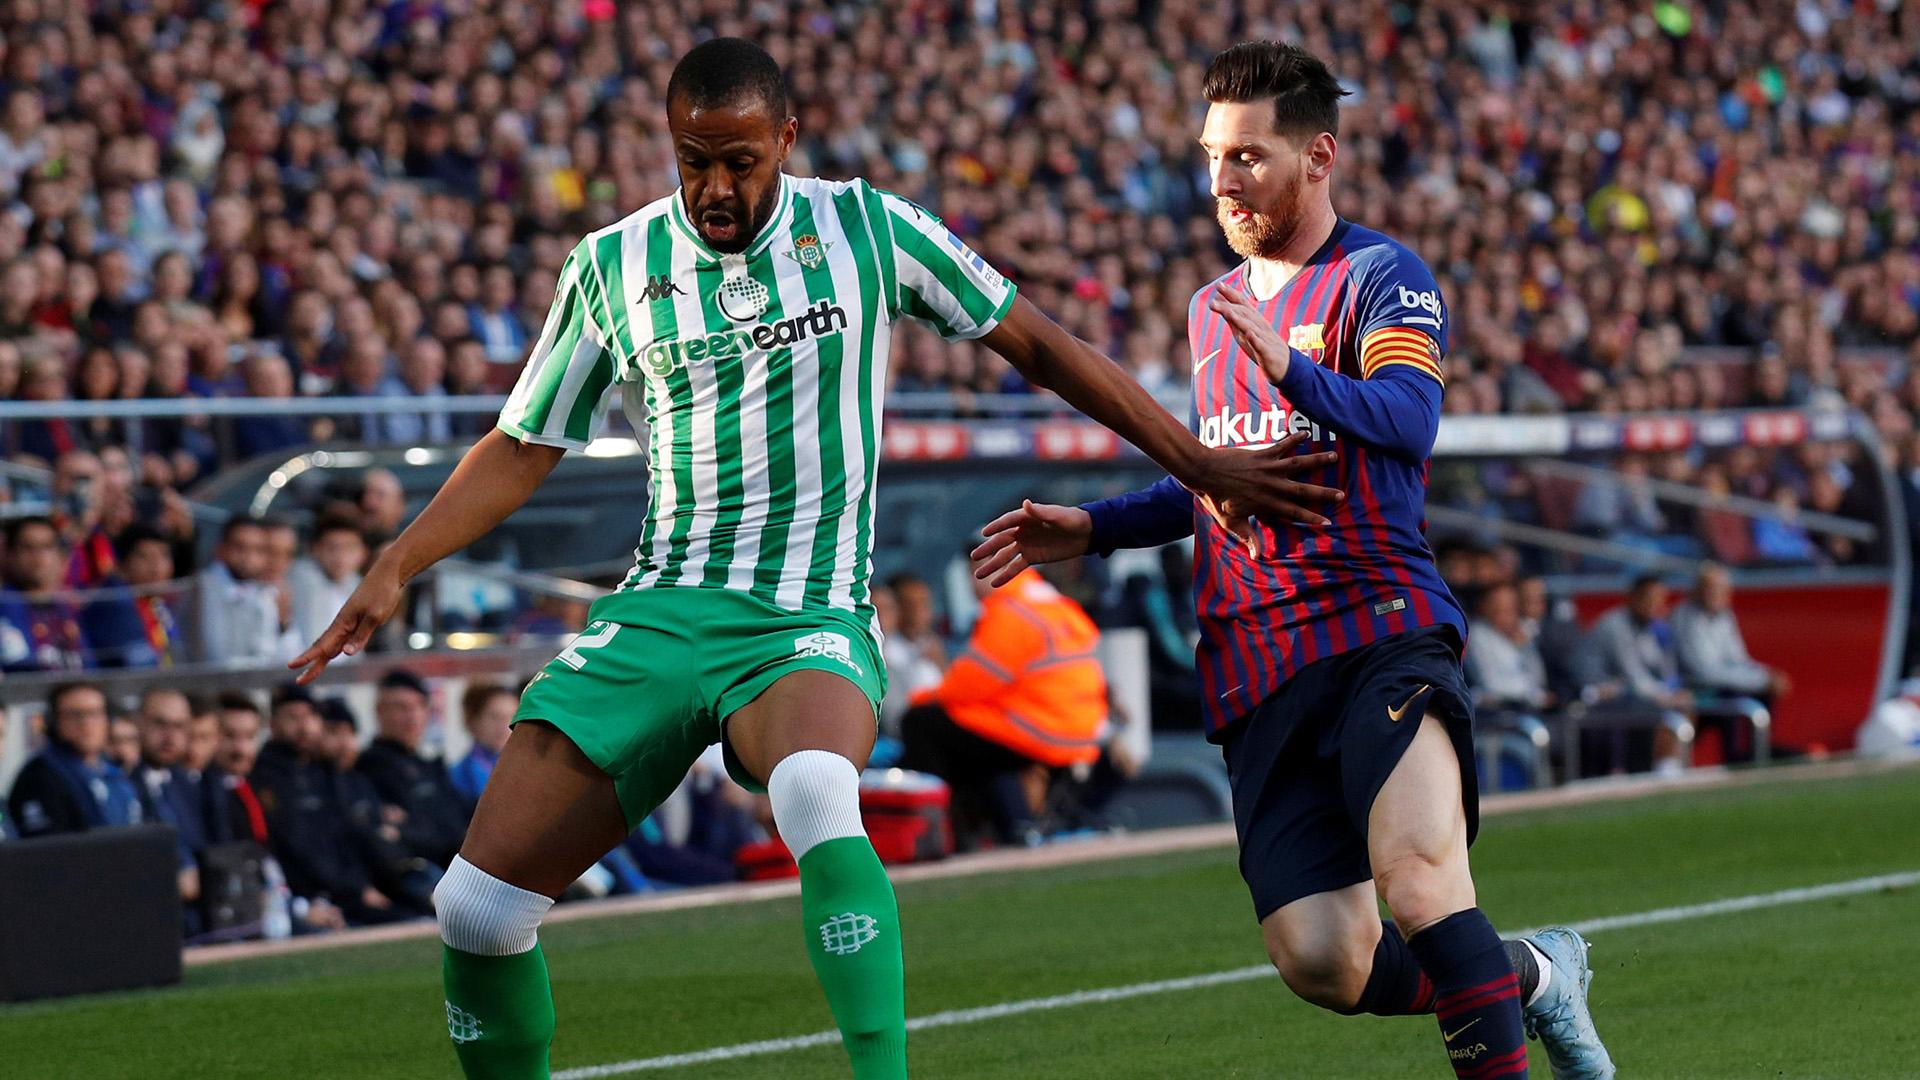 Soccer Football – La Liga Santander – FC Barcelona v Real Betis – Camp Nou, Barcelona, Spain – November 11, 2018 Barcelona's Lionel Messi in action with Real Betis' Sidnei REUTERS/Albert Gea